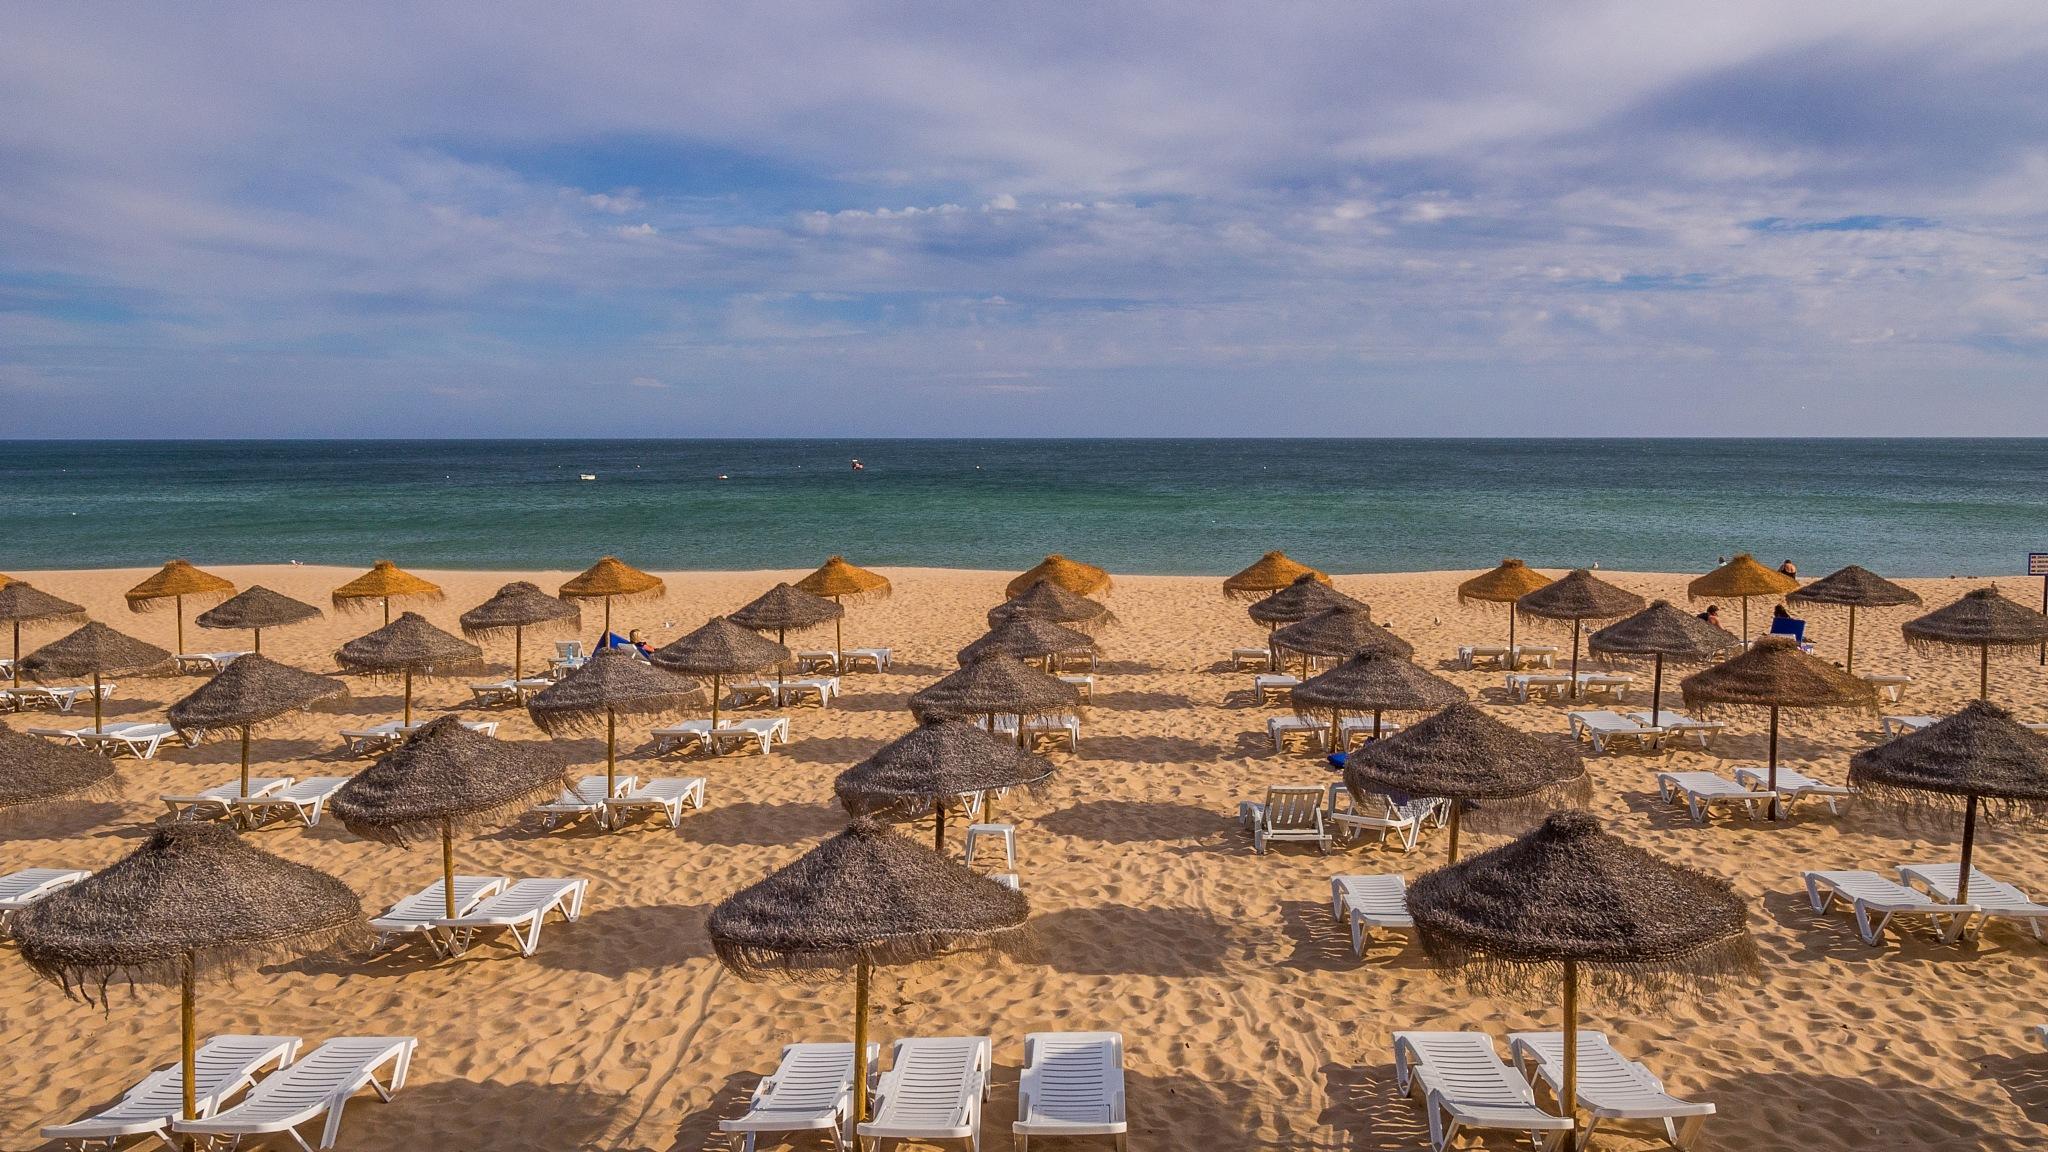 The beach by Tomasz Banasiak